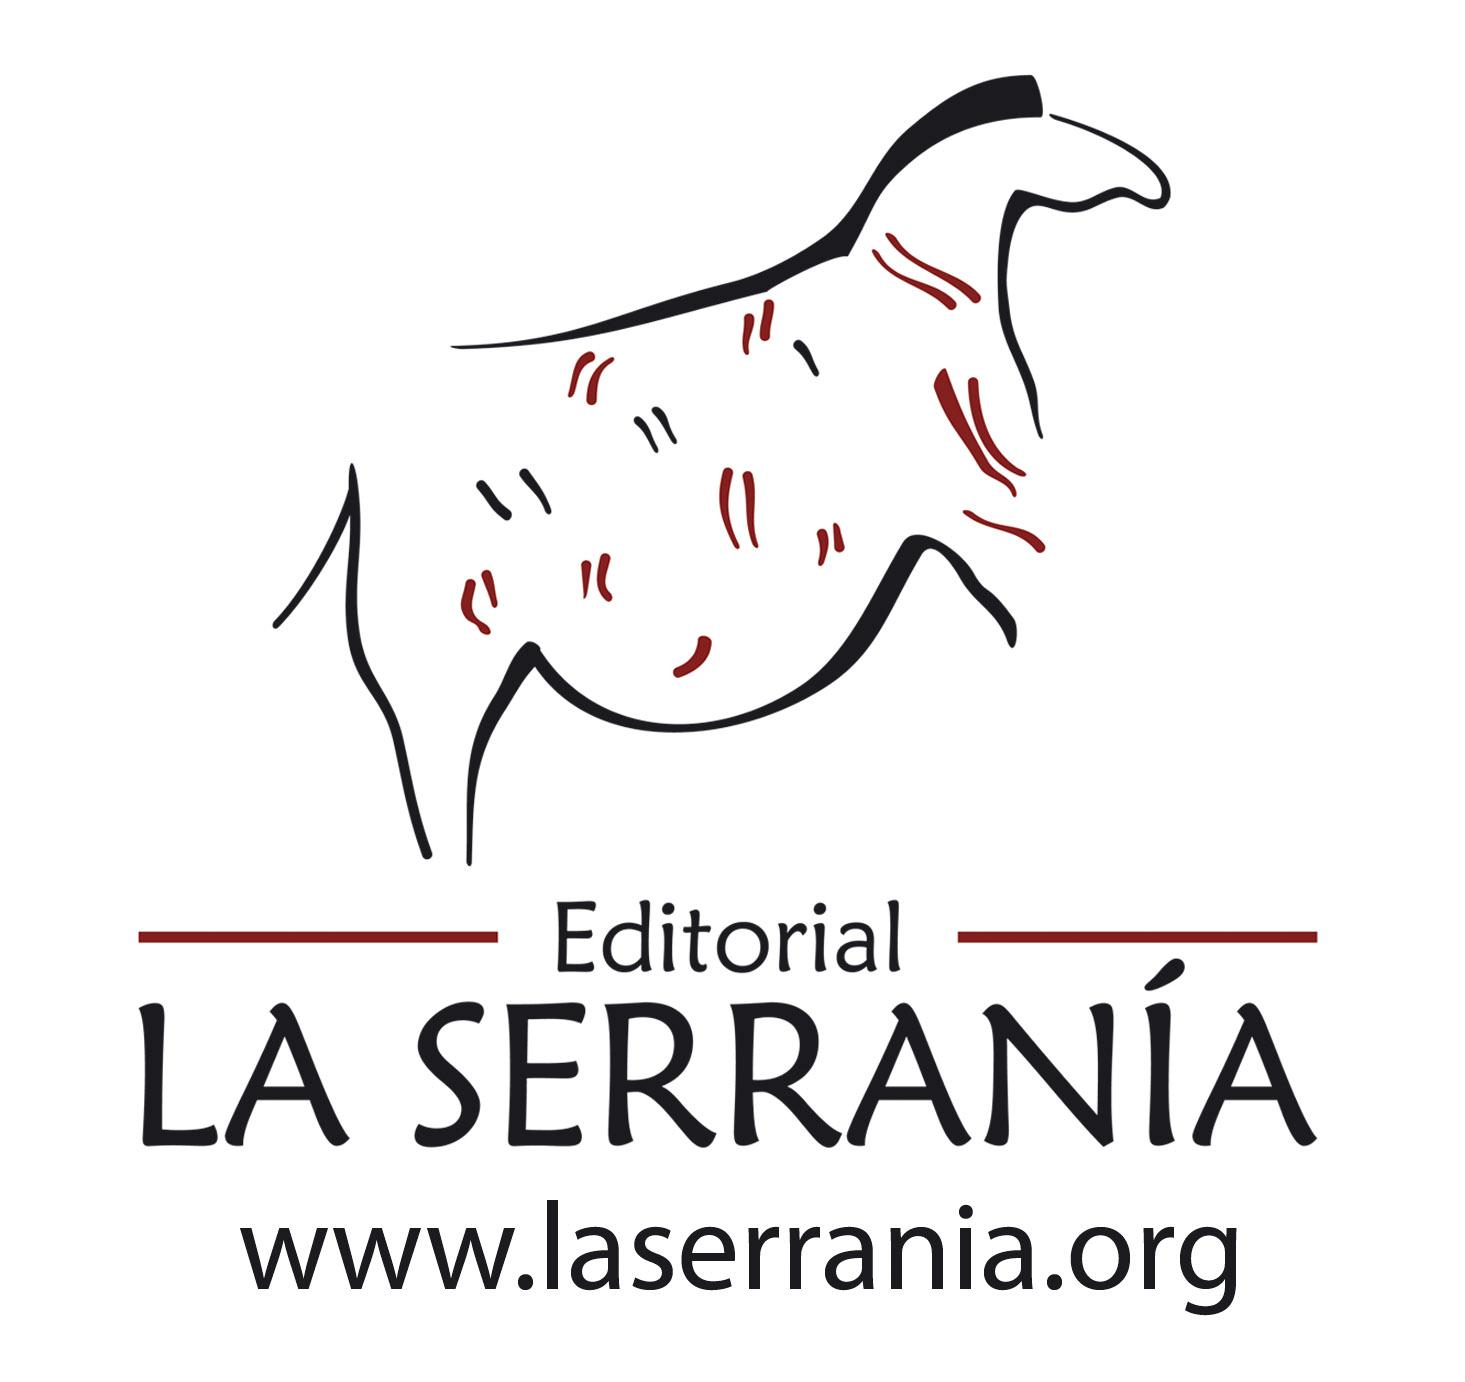 http://www.laserrania.org/